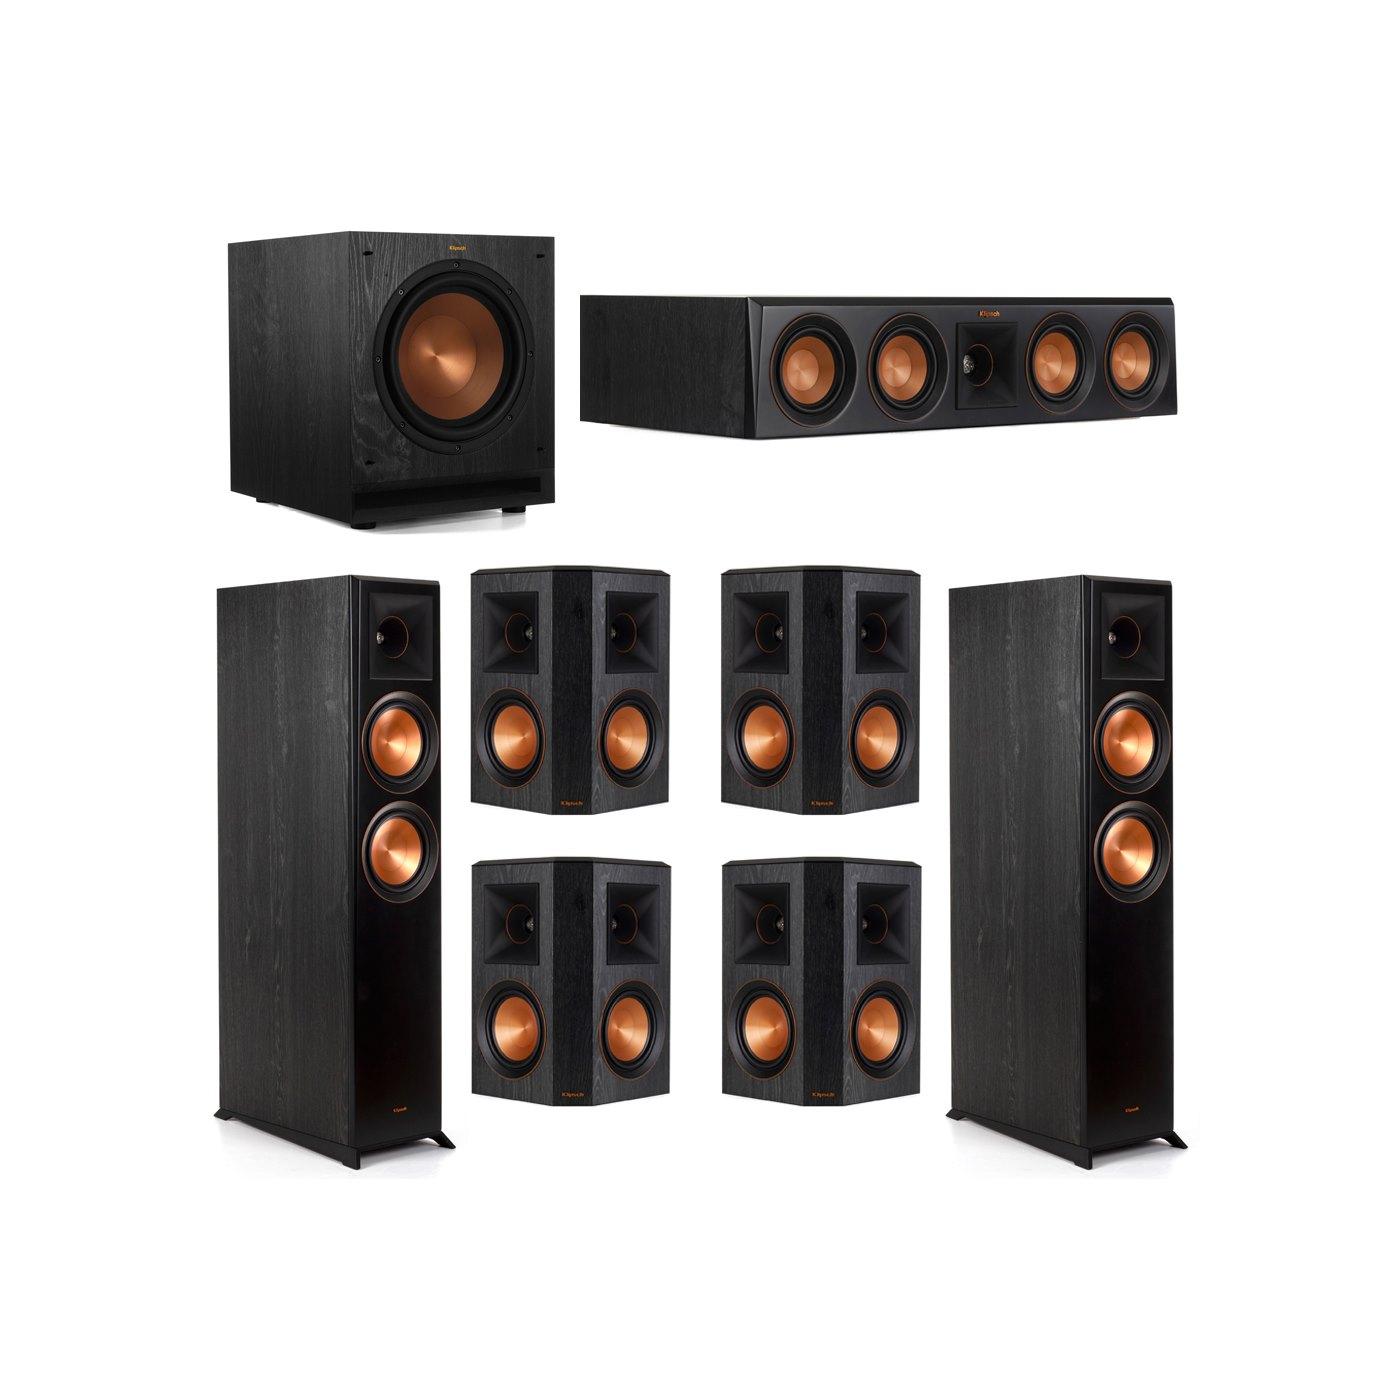 Klipsch 7.1 System with 2 RP-6000F Floorstanding Speakers, 1 Klipsch RP-404C Center Speaker, 4 Klipsch RP-502S Surround Speakers, 1 Klipsch SPL-100 Subwoofer